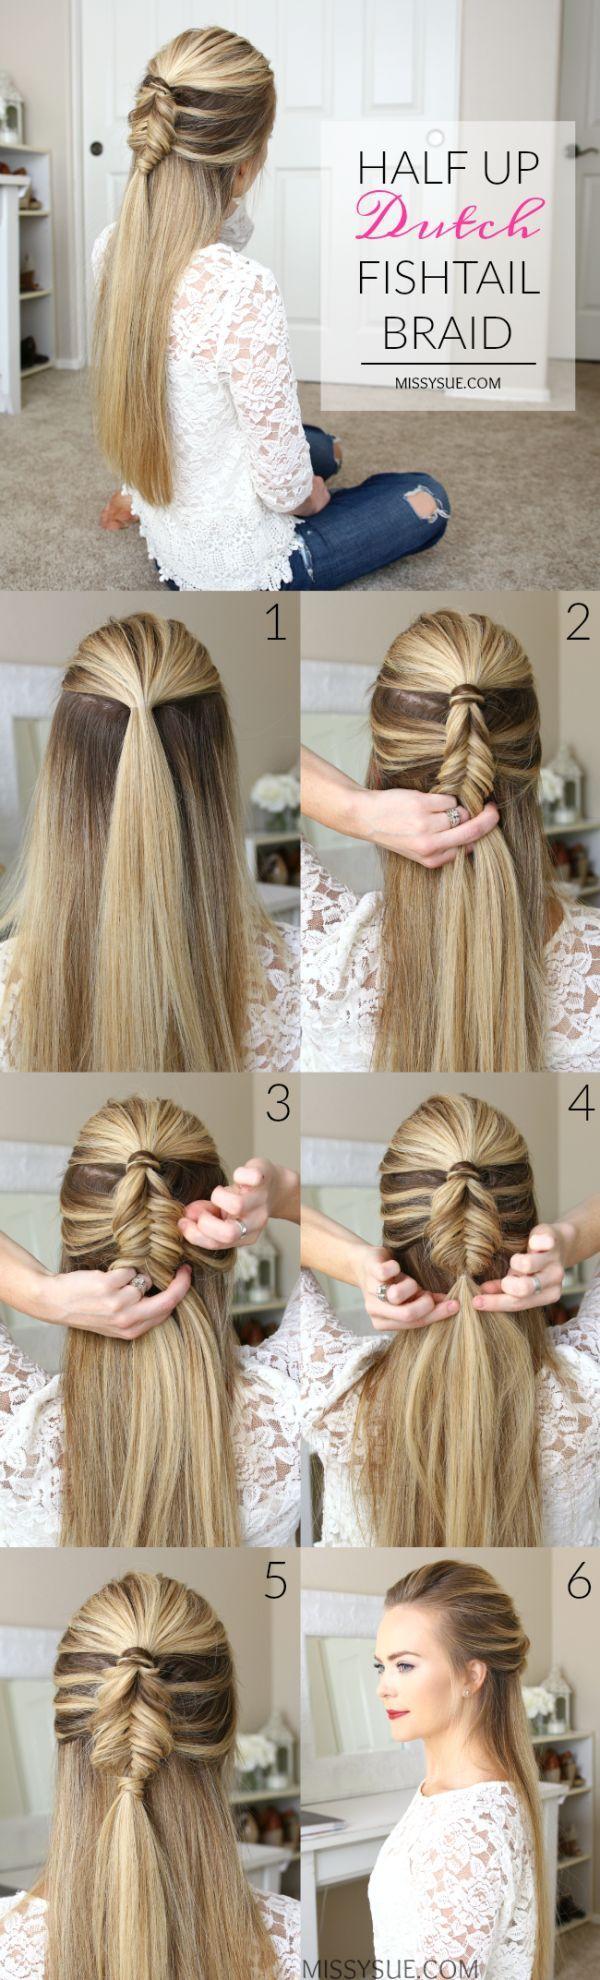 short hair style ideas for women hair pinterest short hair